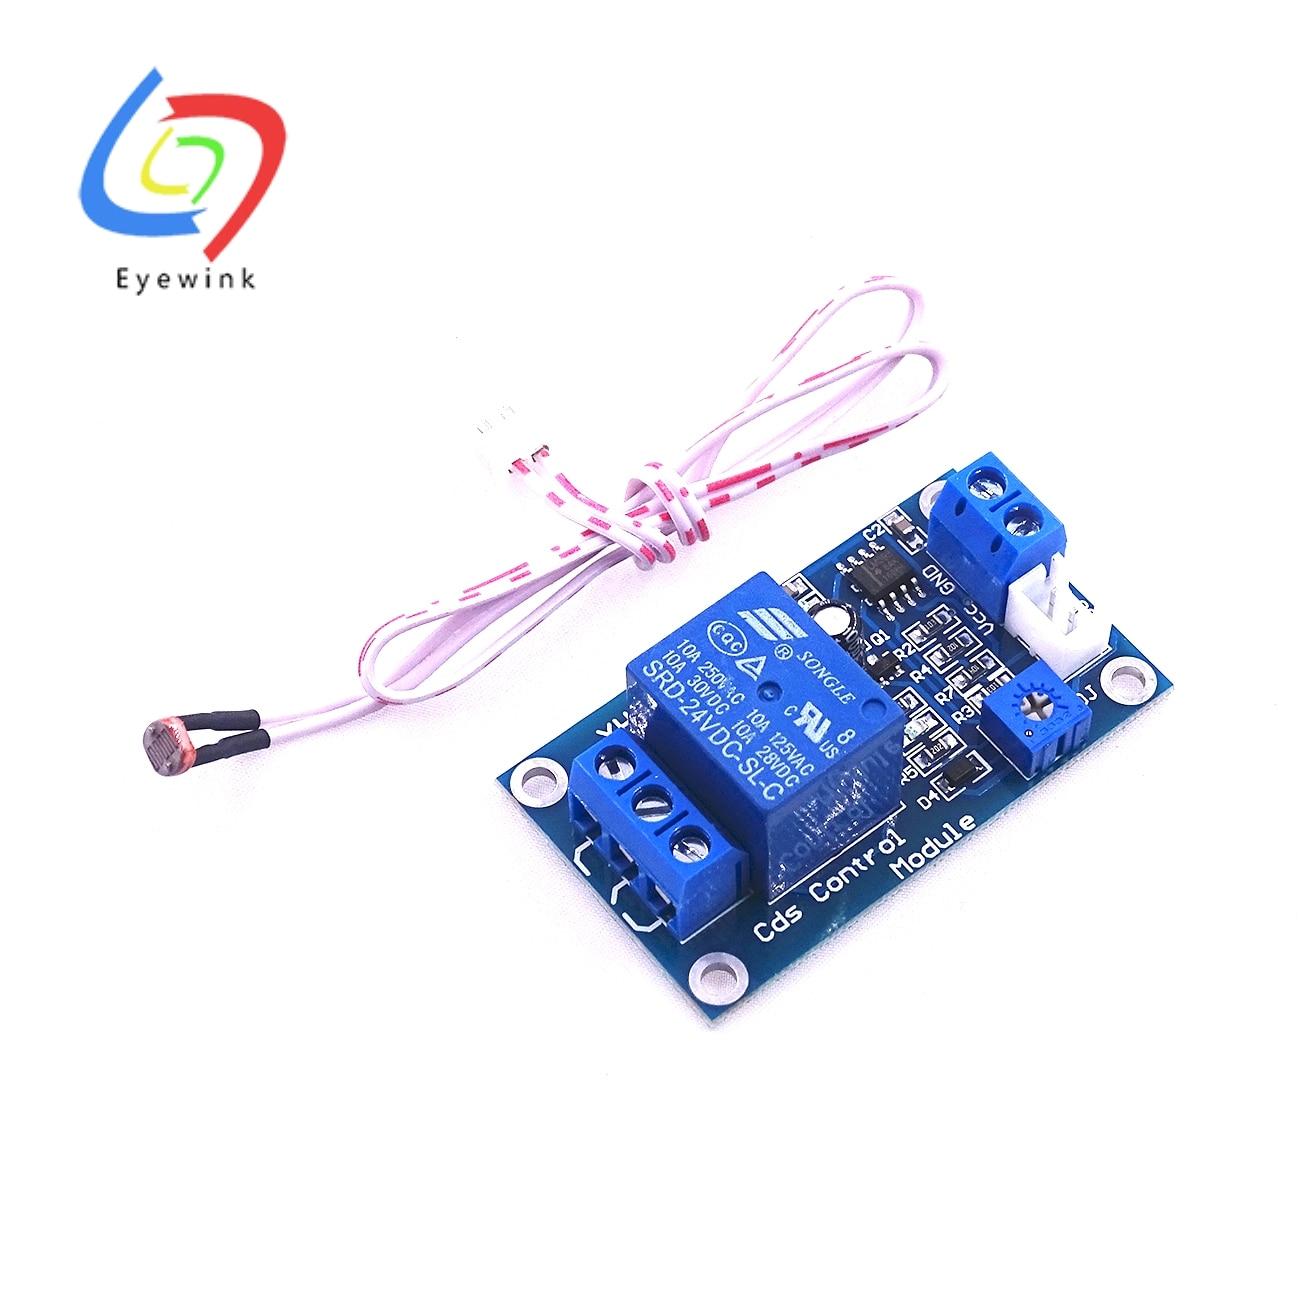 24V XH-M131 Light Control Switch Photoresistor Relay Module Detection Sensor